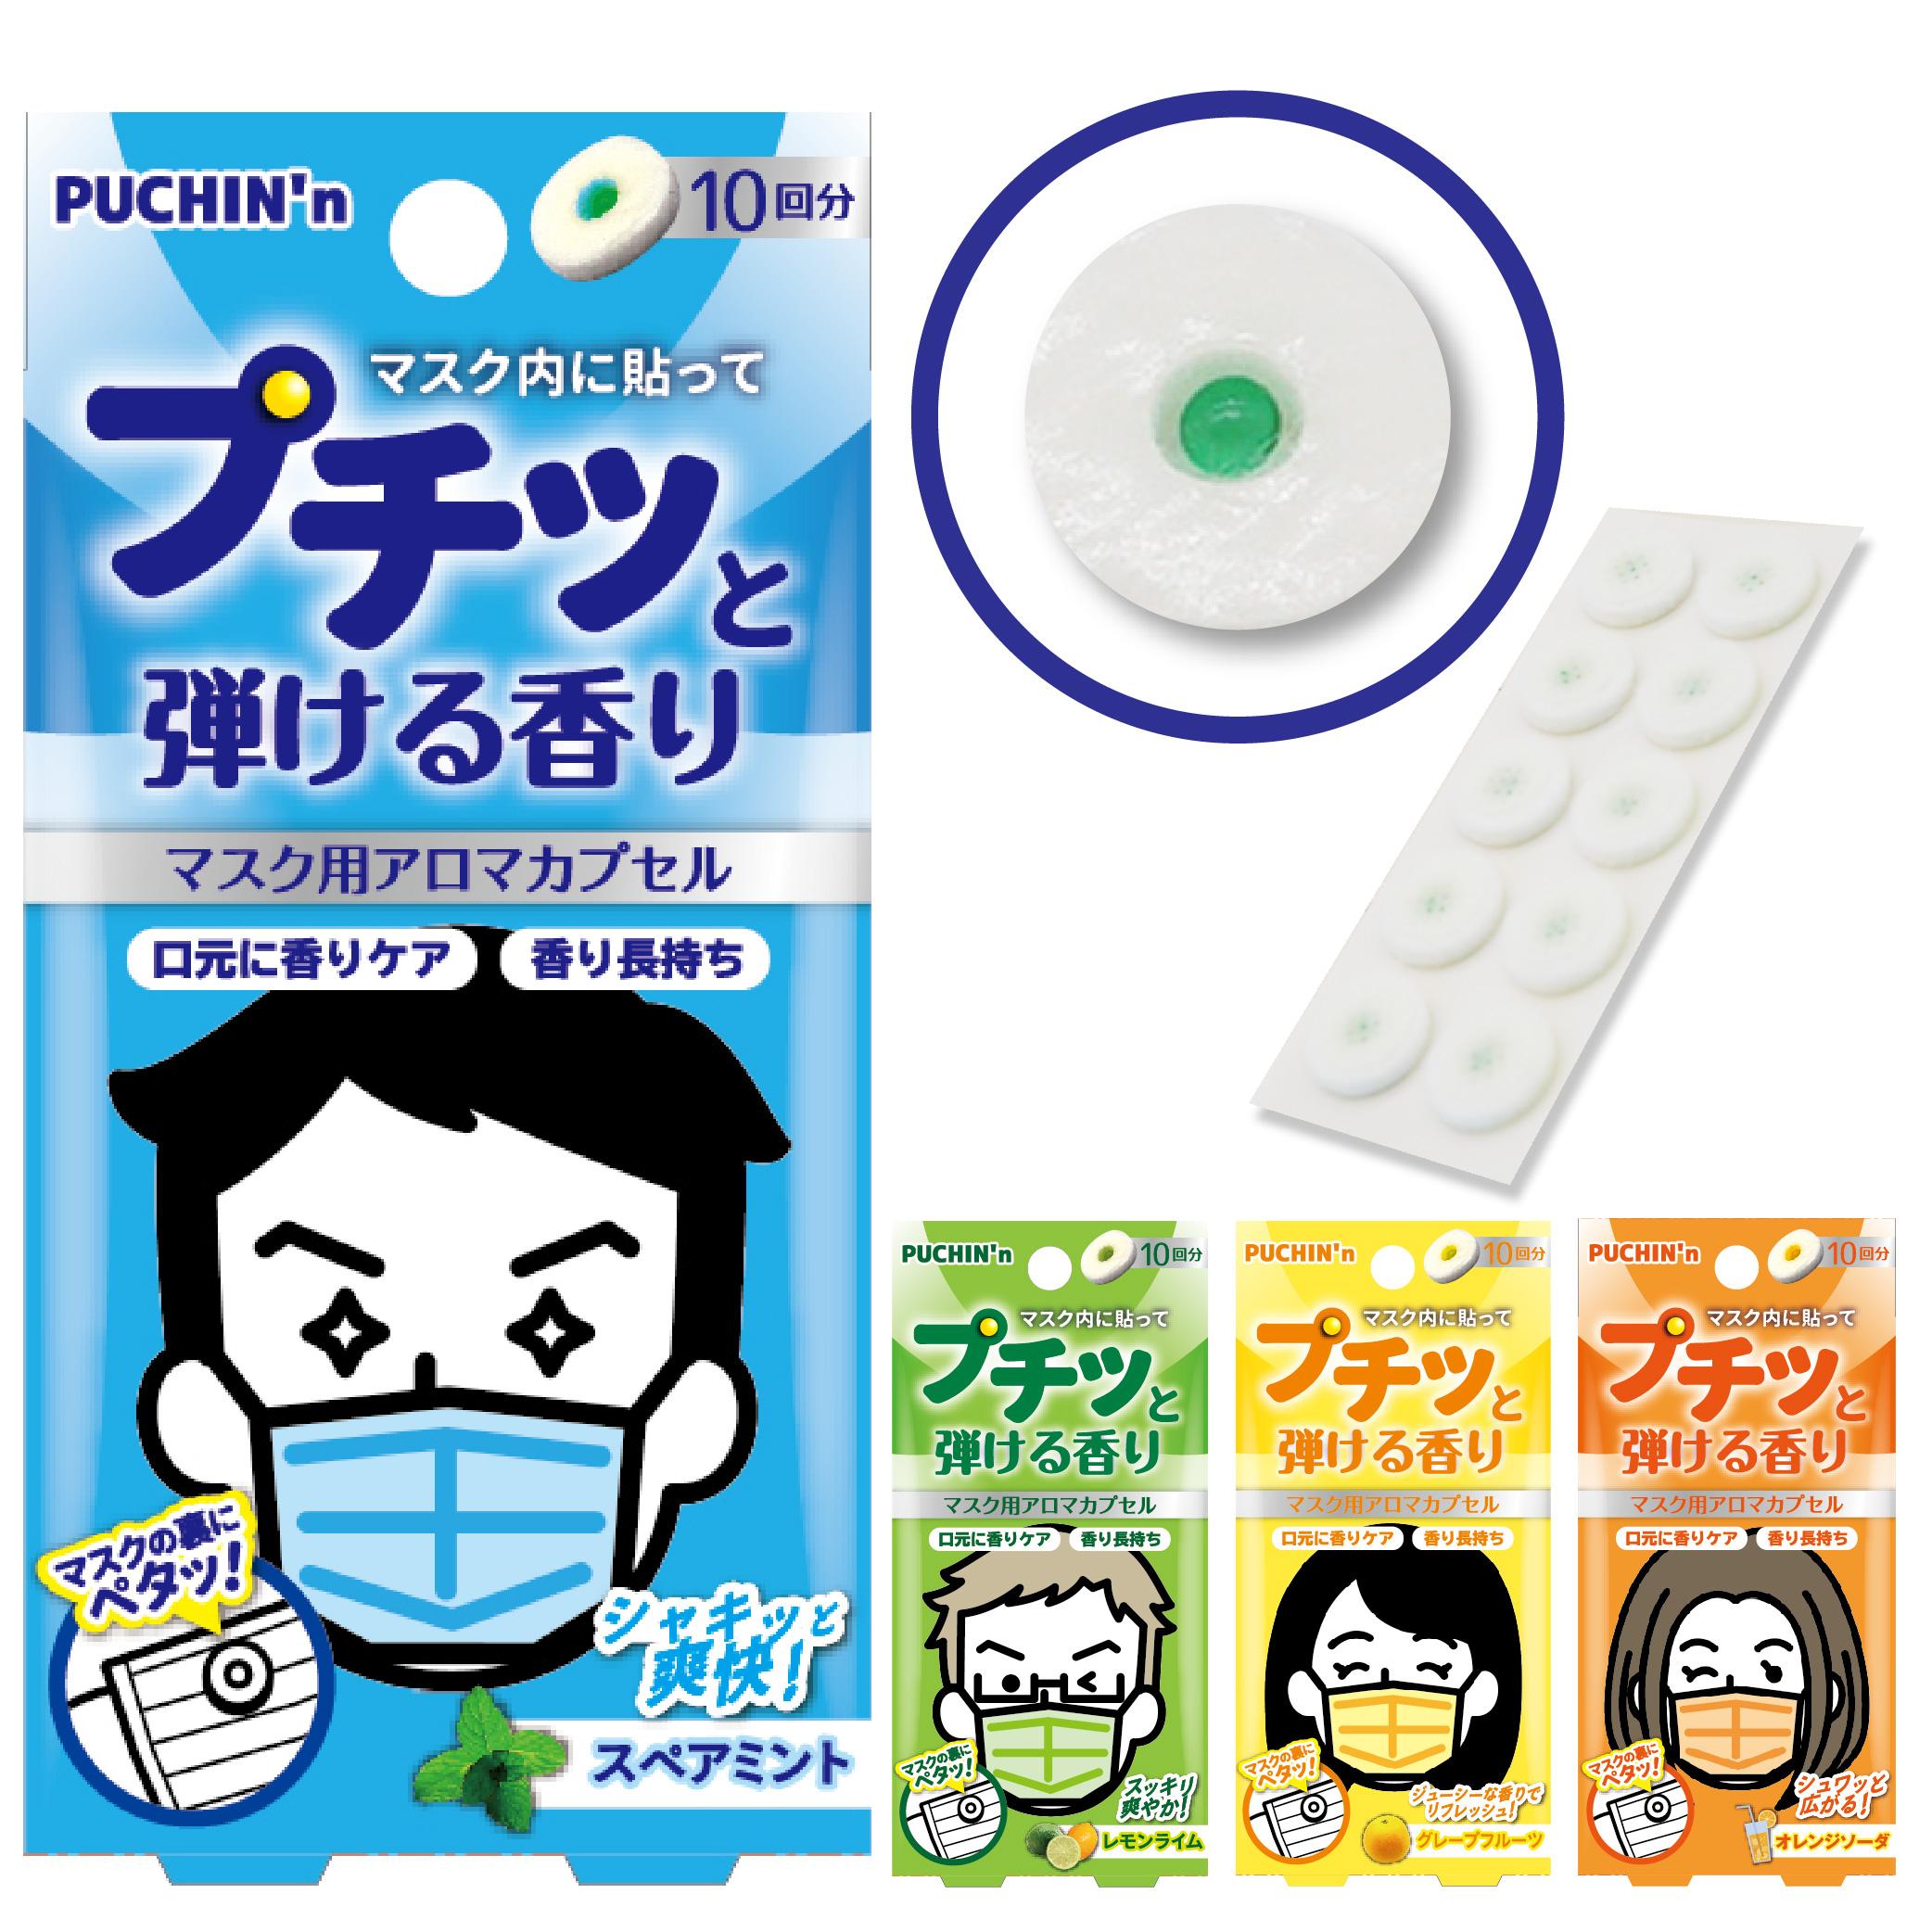 PUCHIN'nプチっと弾ける香り(マスク用アロマカプセル)の仕入れ、卸し問屋ならミュー株式会社